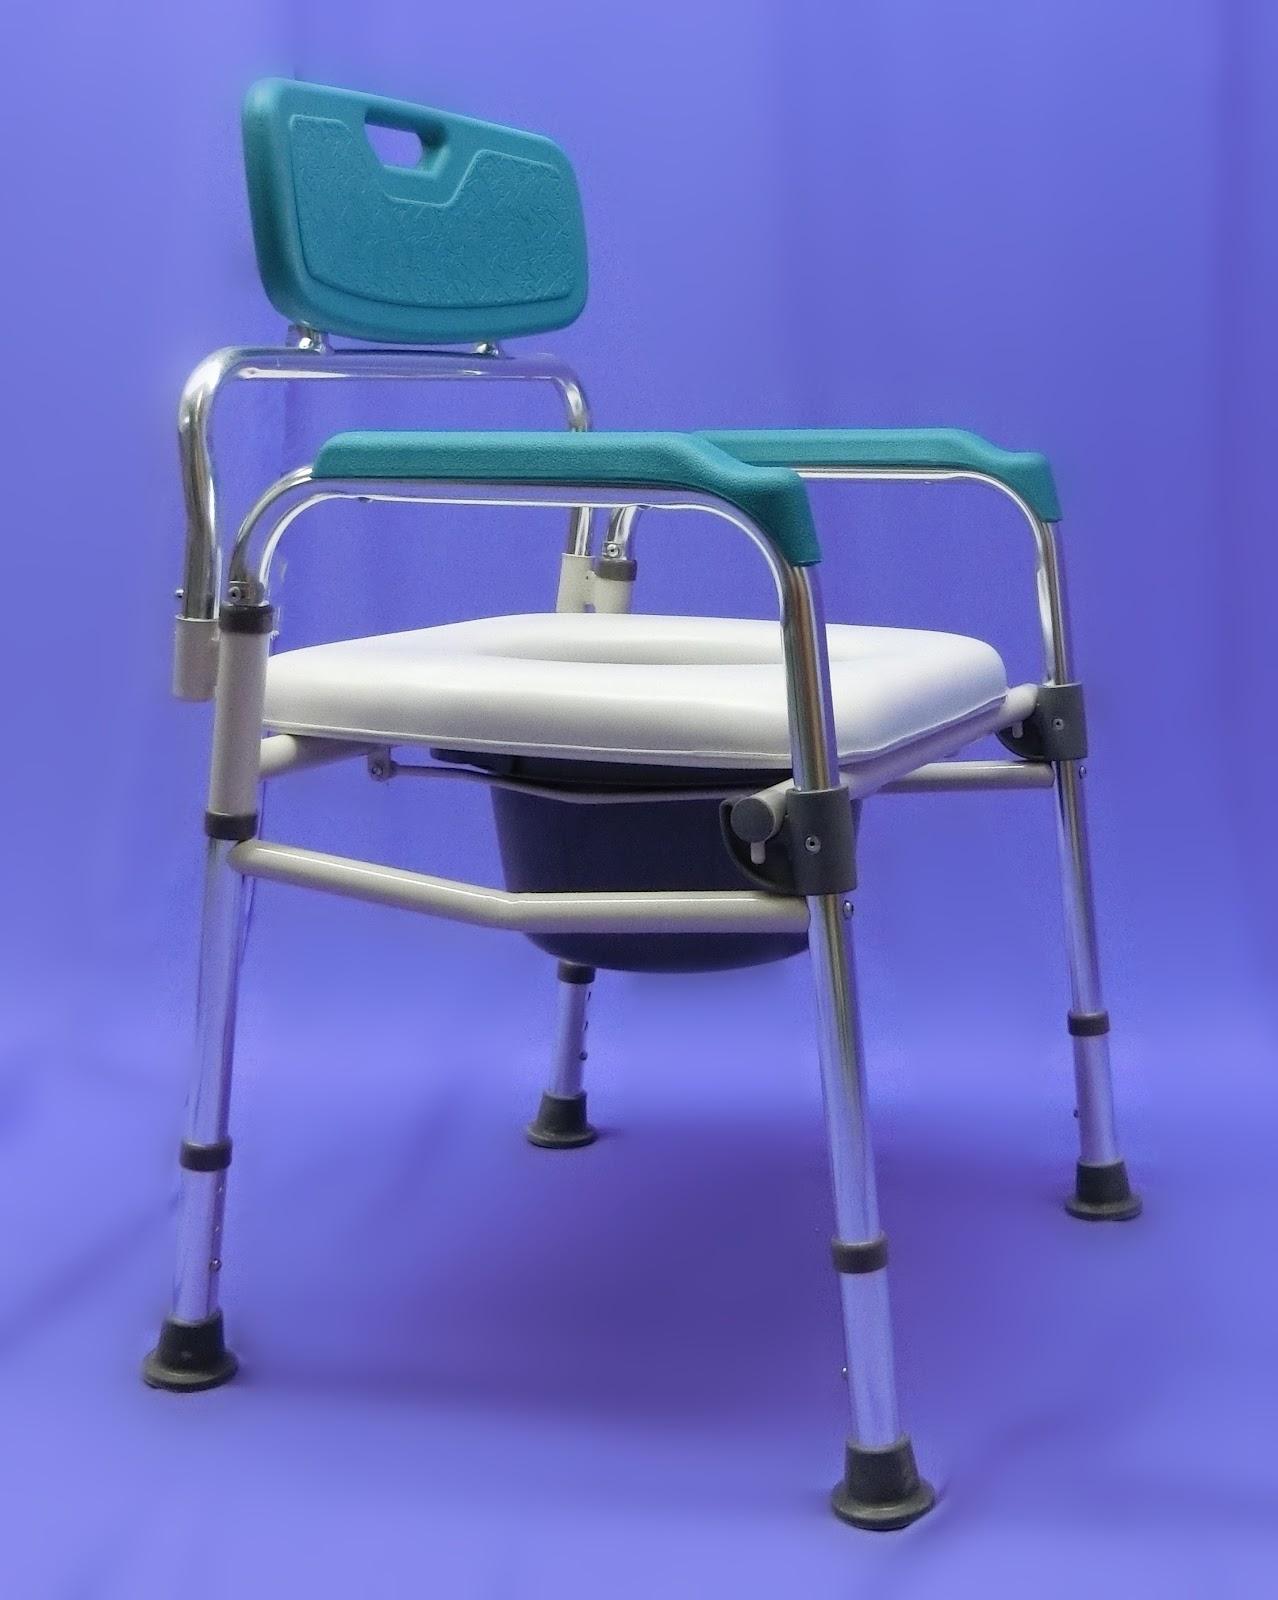 shower chair malaysia peg perego prima pappa zero3 high reviews aluminium folding commode penang kerusi